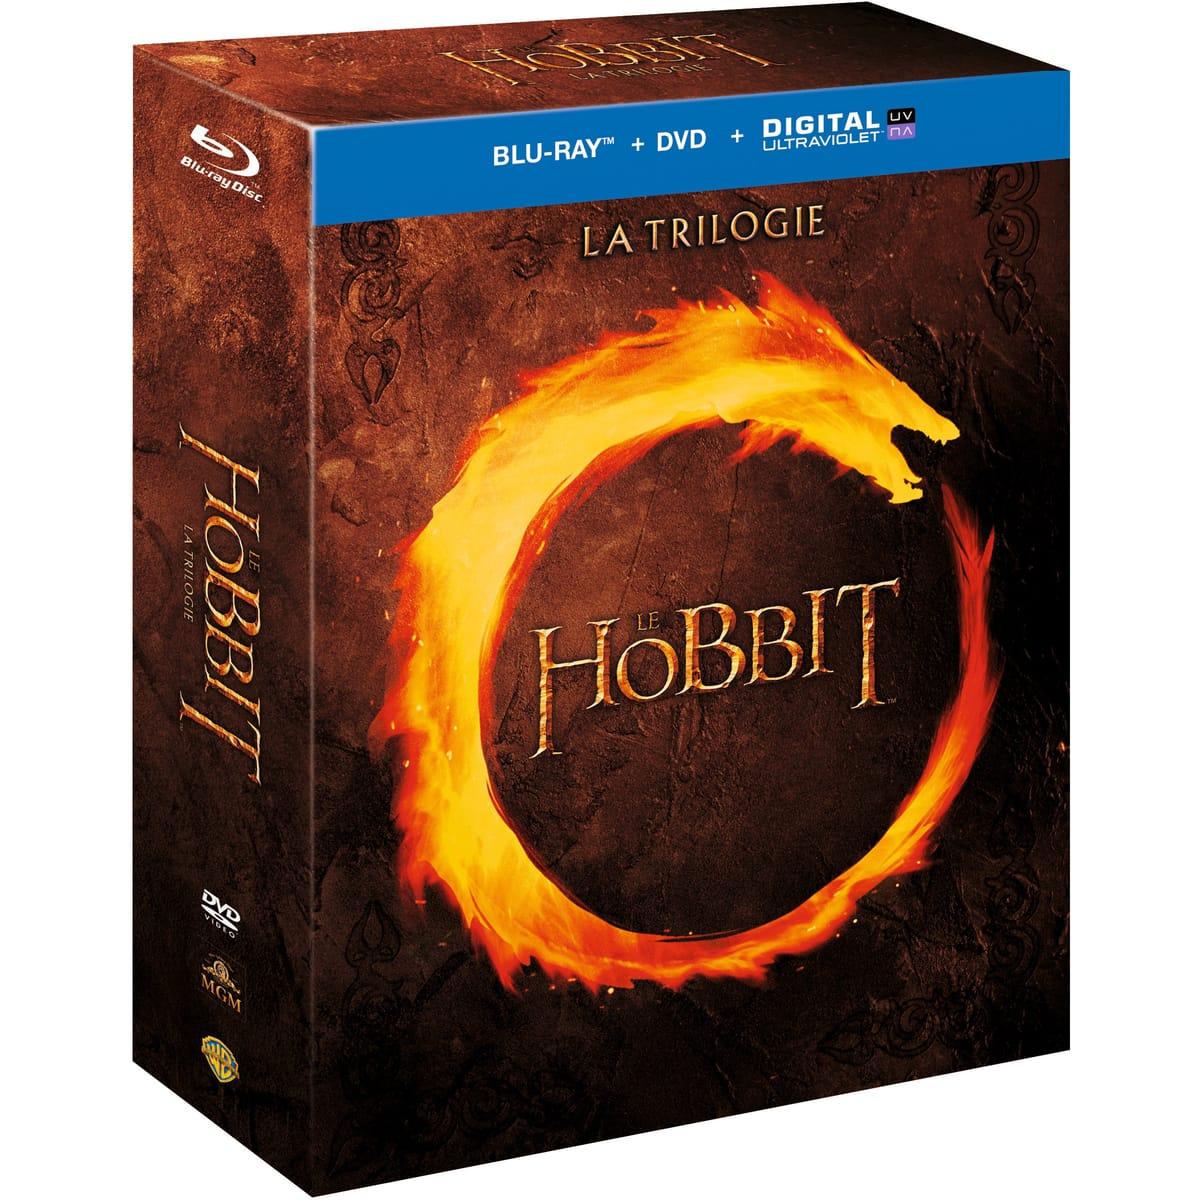 Coffret Blu-ray + DVD + Copie digitale Le Hobbit - La Trilogie